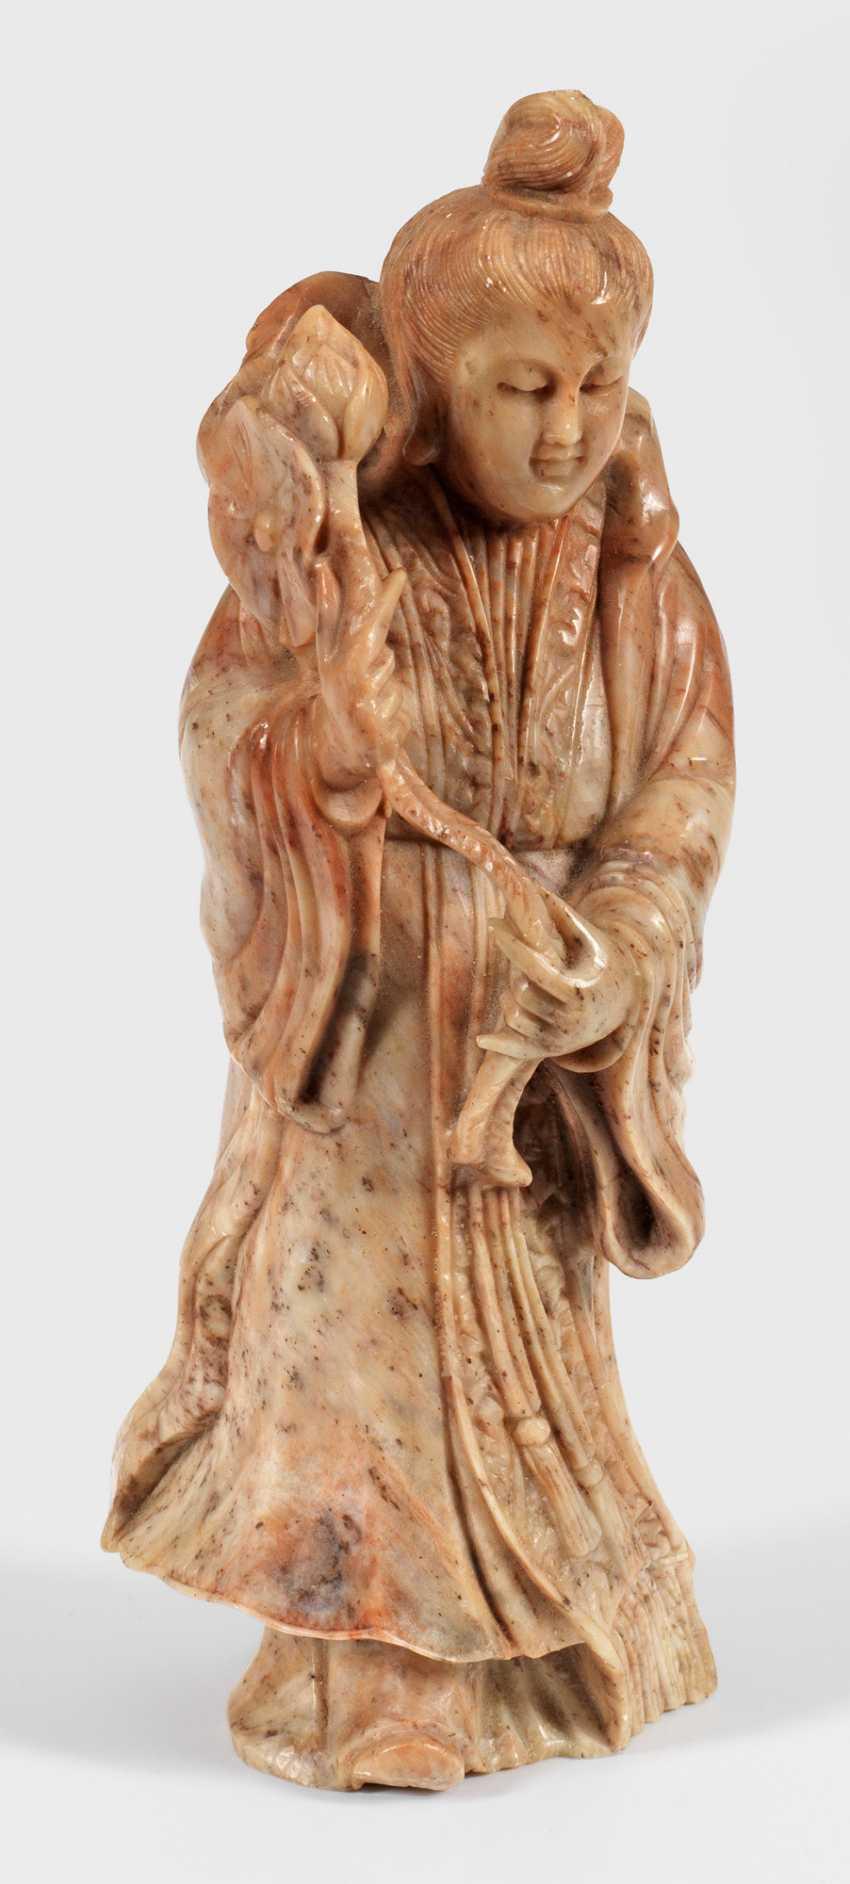 Soapstone carving - photo 1